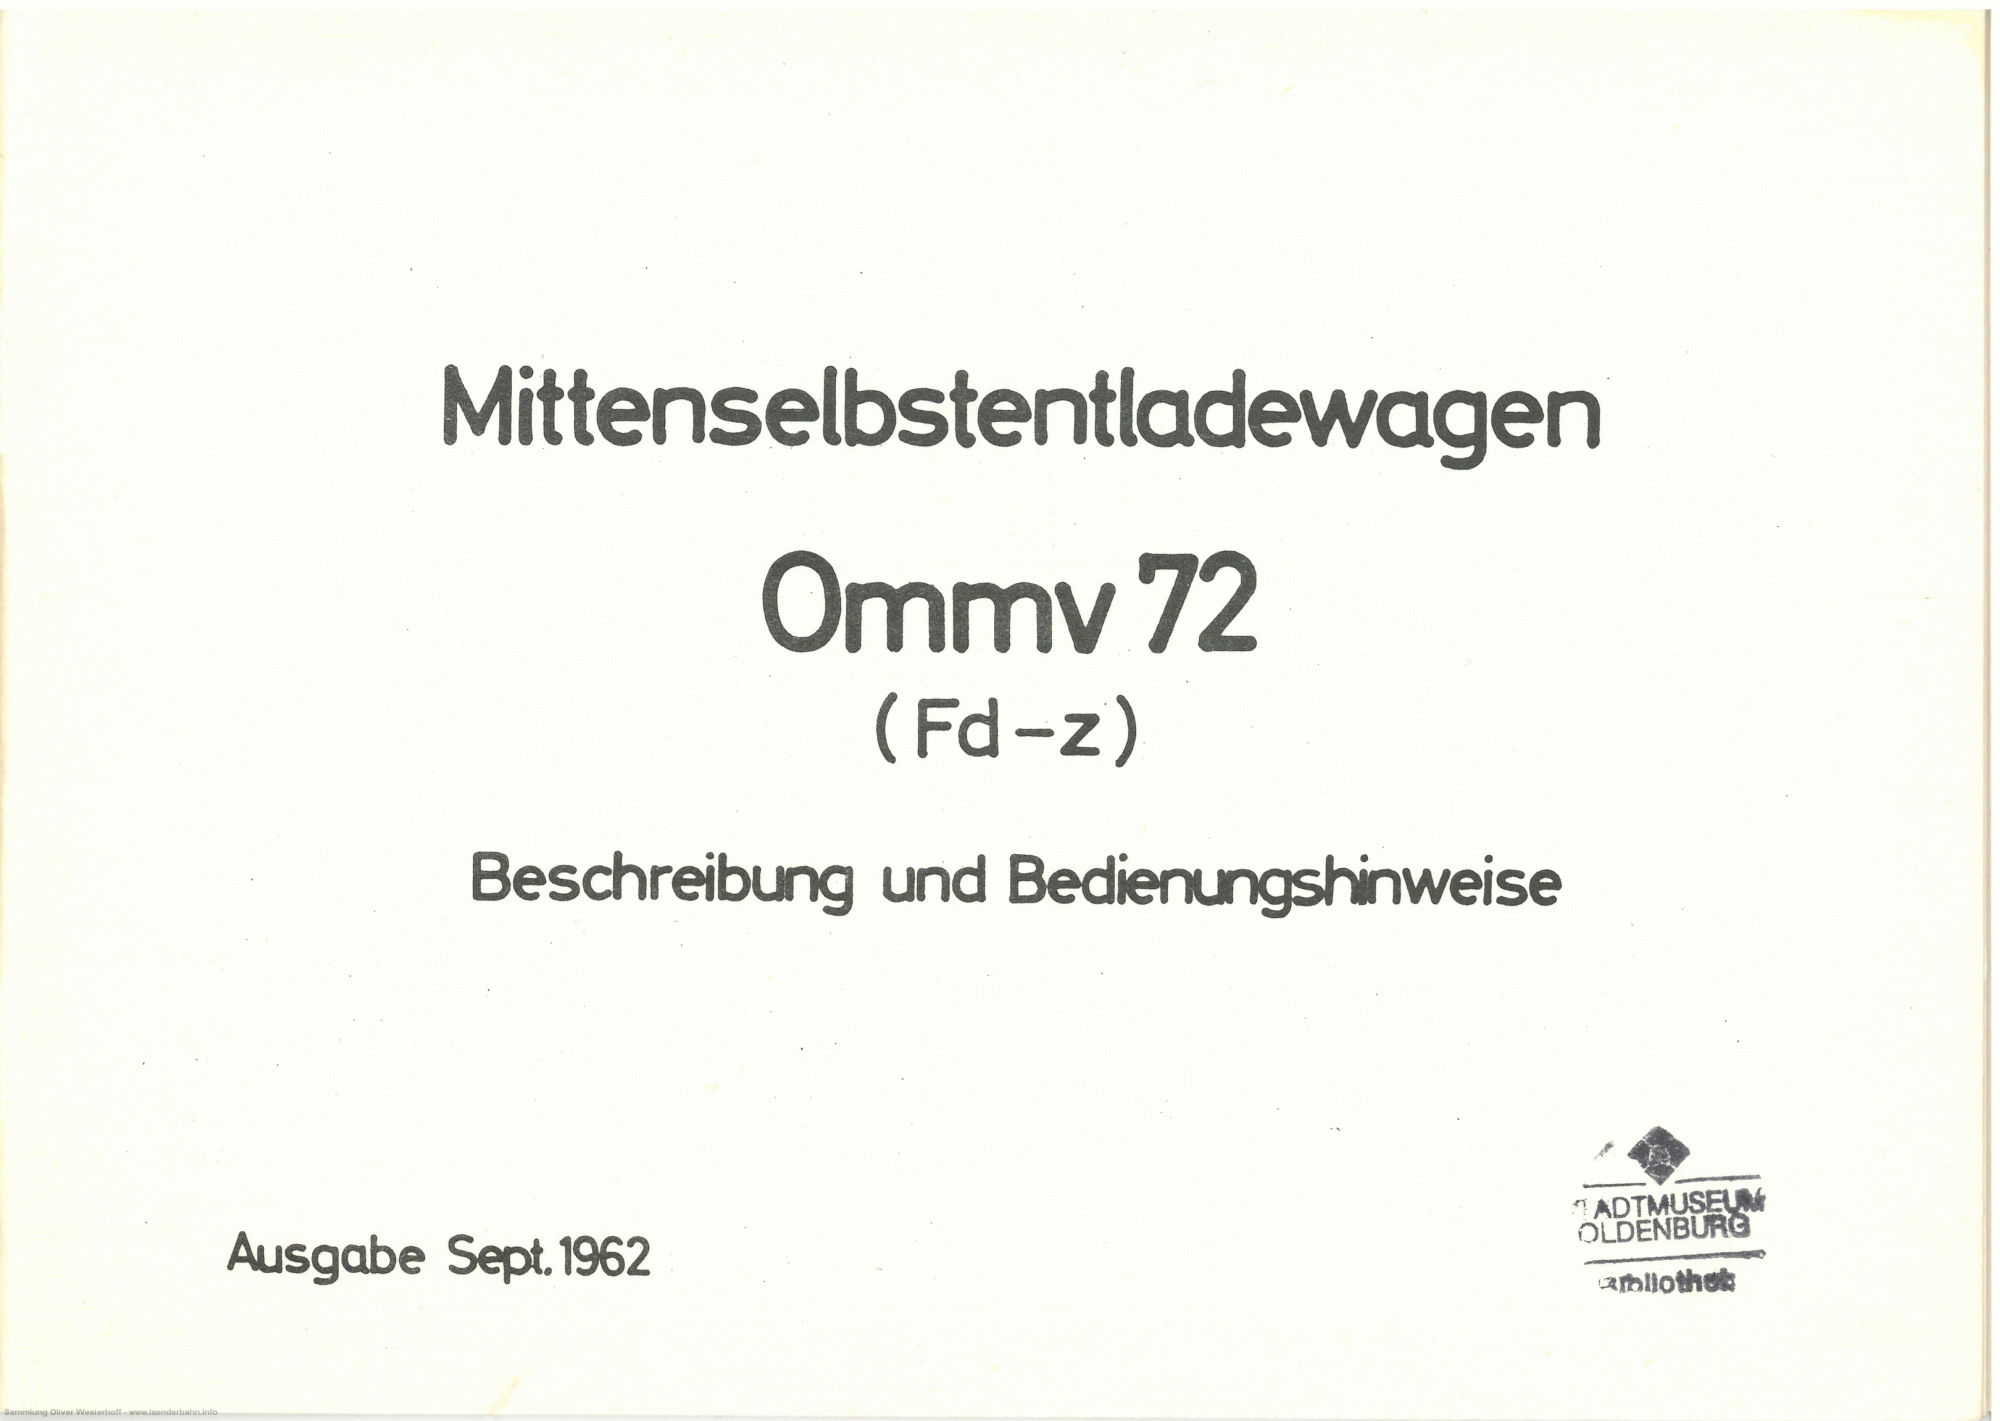 https://www.laenderbahn.info/hifo/20181008/ommv72_seite_0003.png